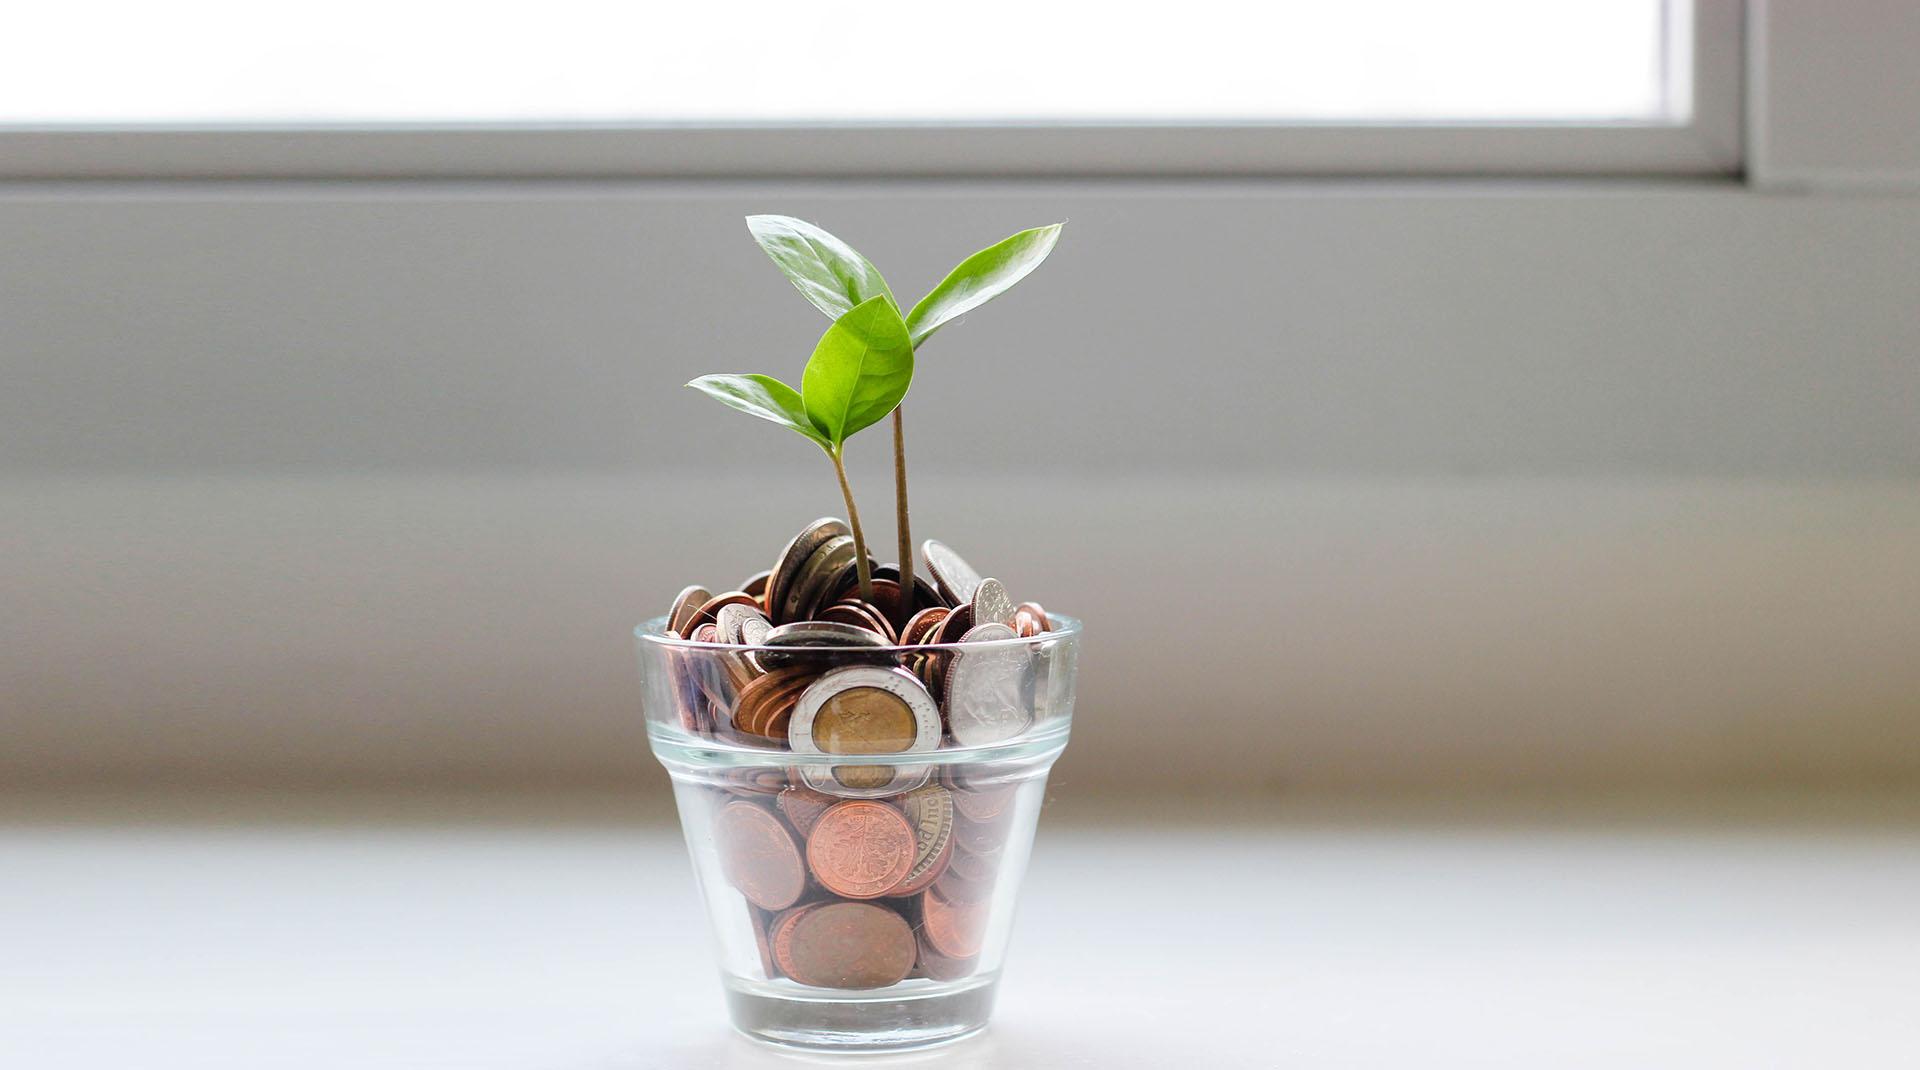 Boletim OA - discutir - Sitemas financeiros ©MicheileHenderson - Unsplash